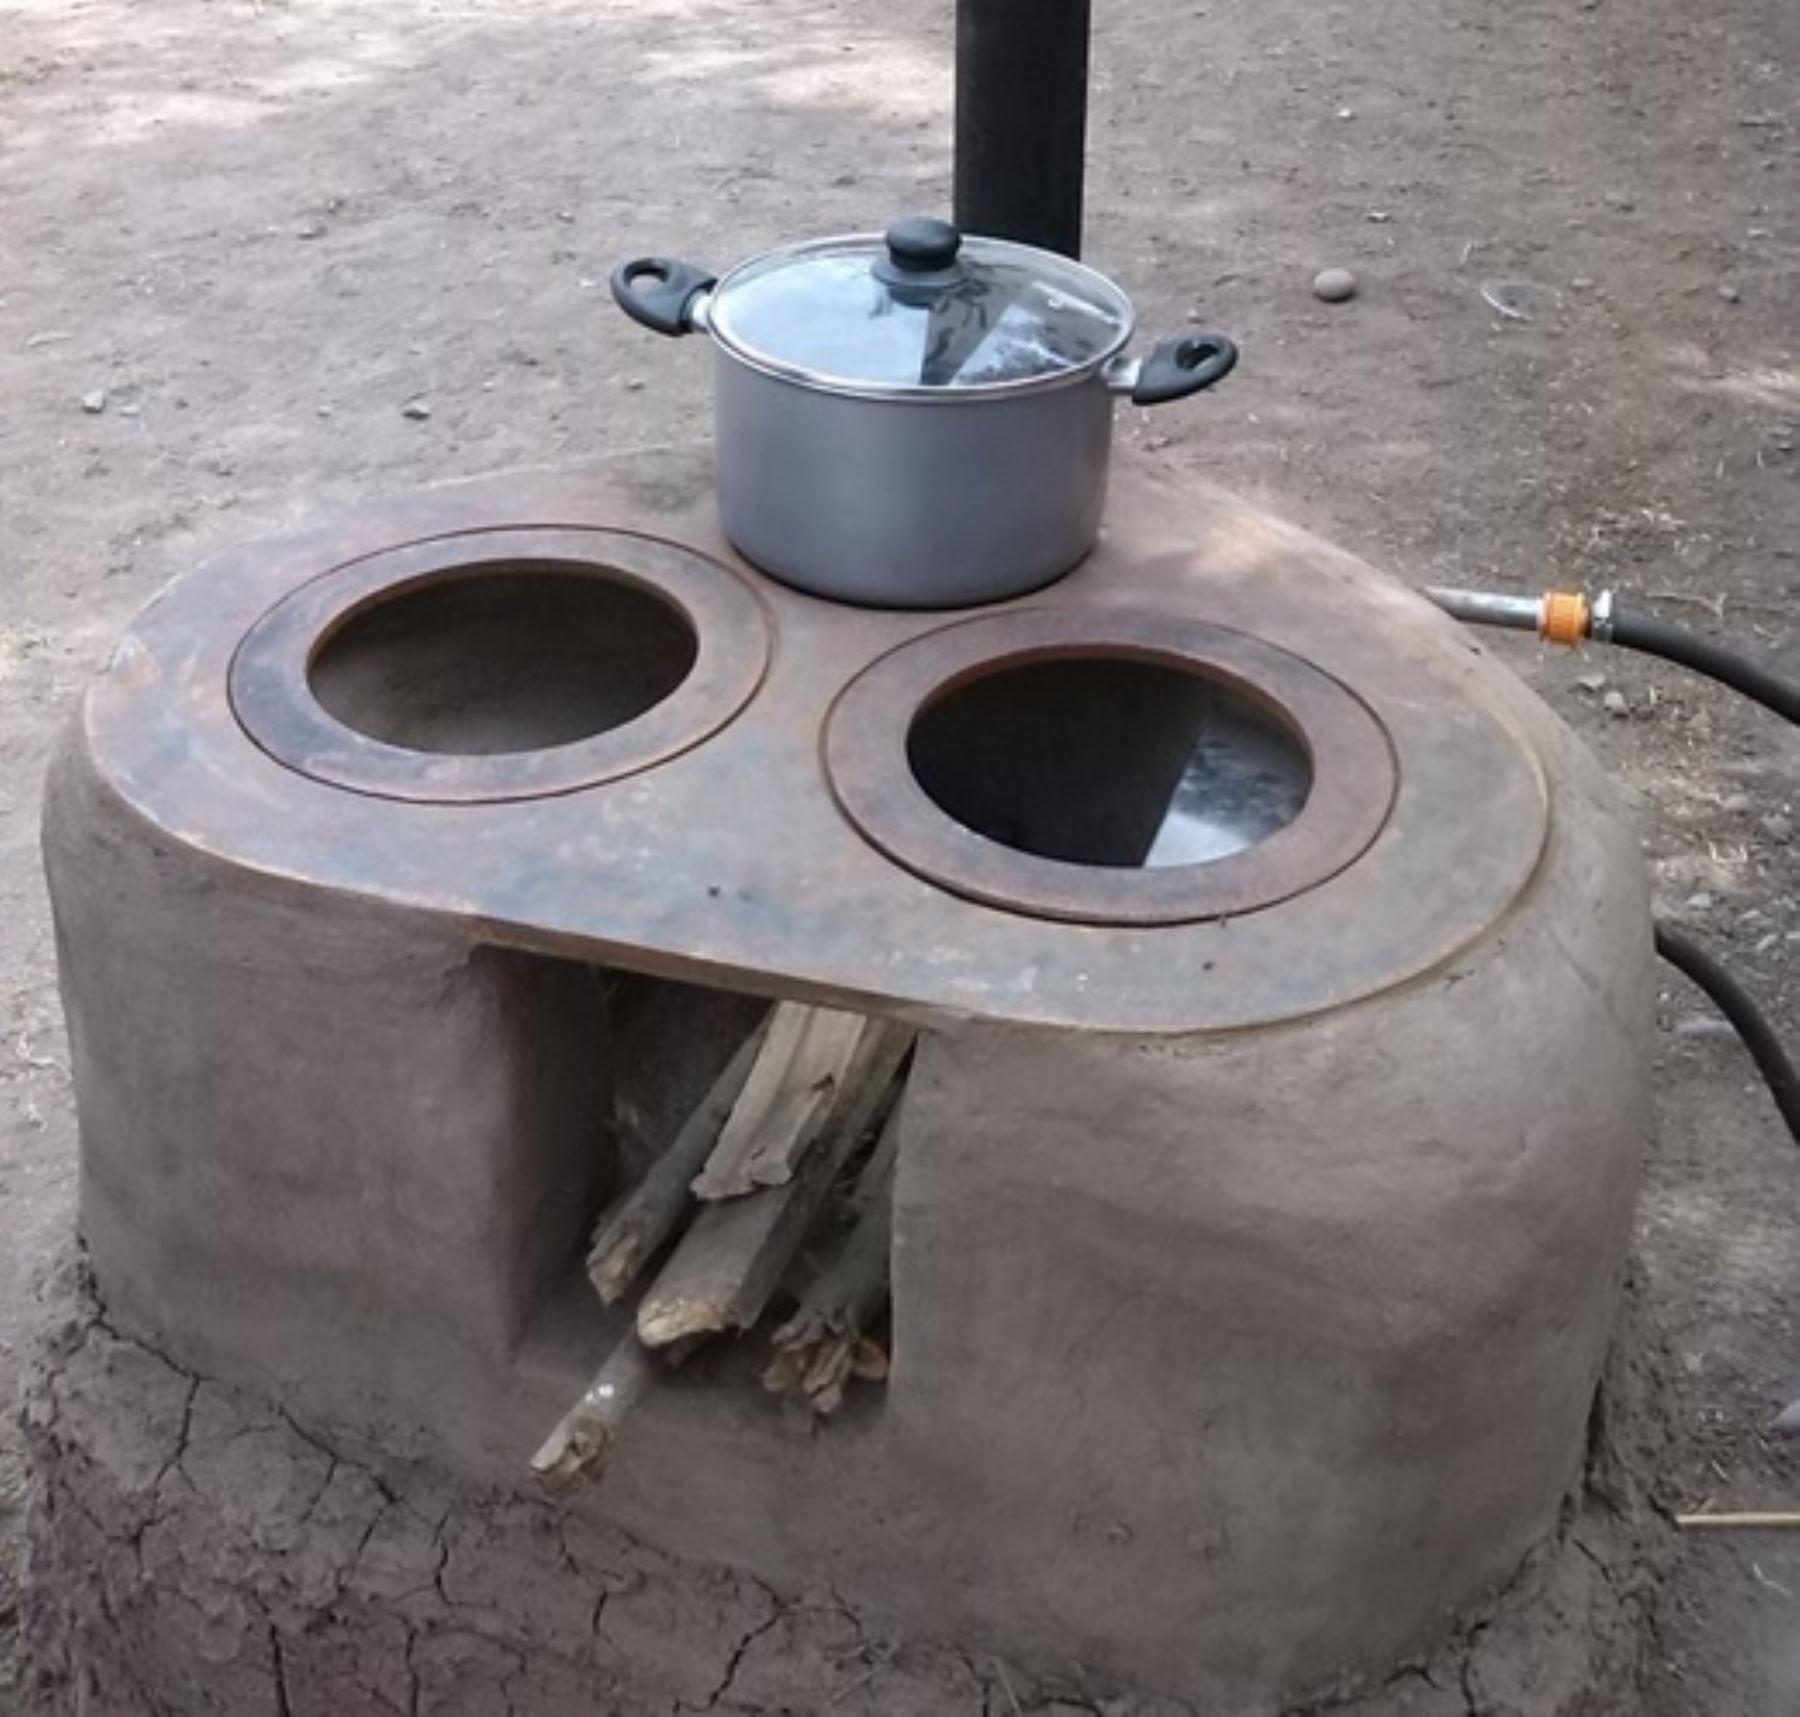 Manual para construir una cocina a le a mejorada for Cocina economica a lena